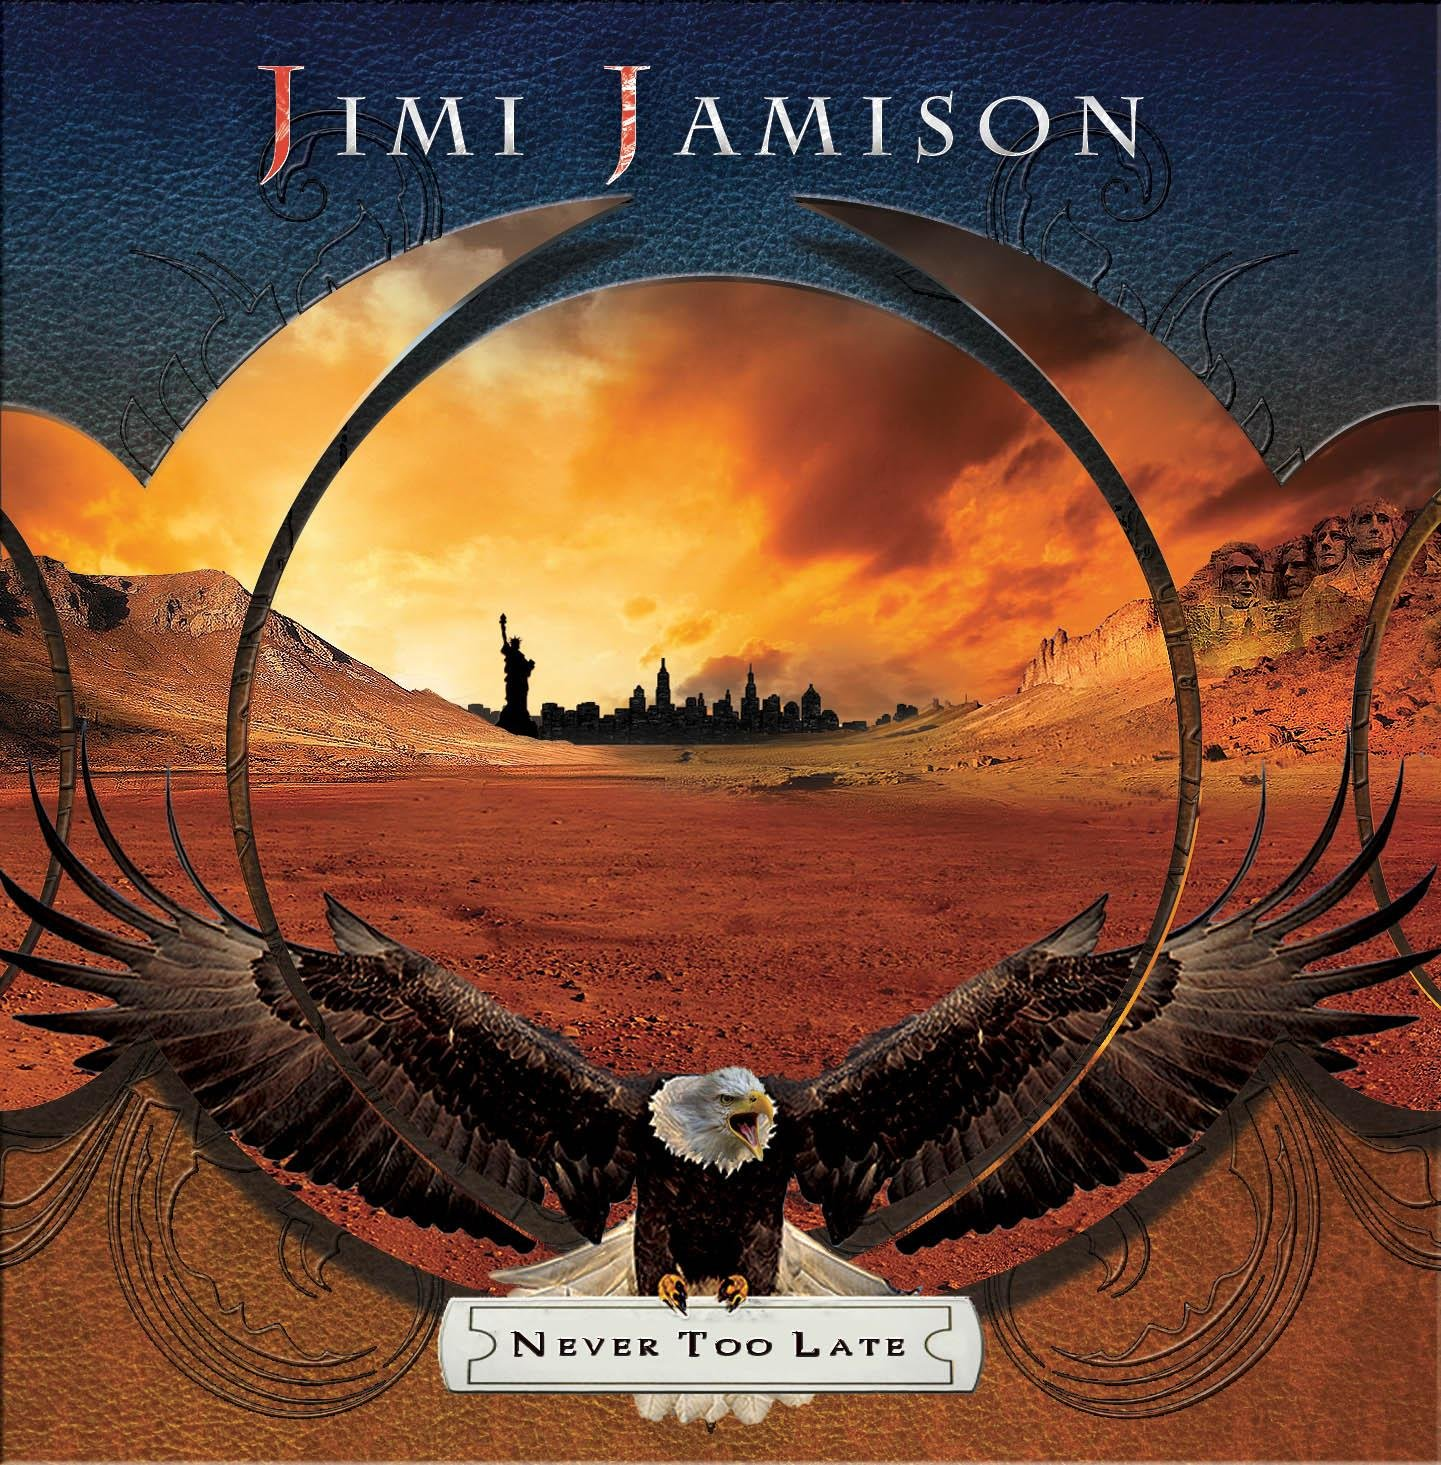 Jimi Jamison - Never Too Late - Amazon.com Music